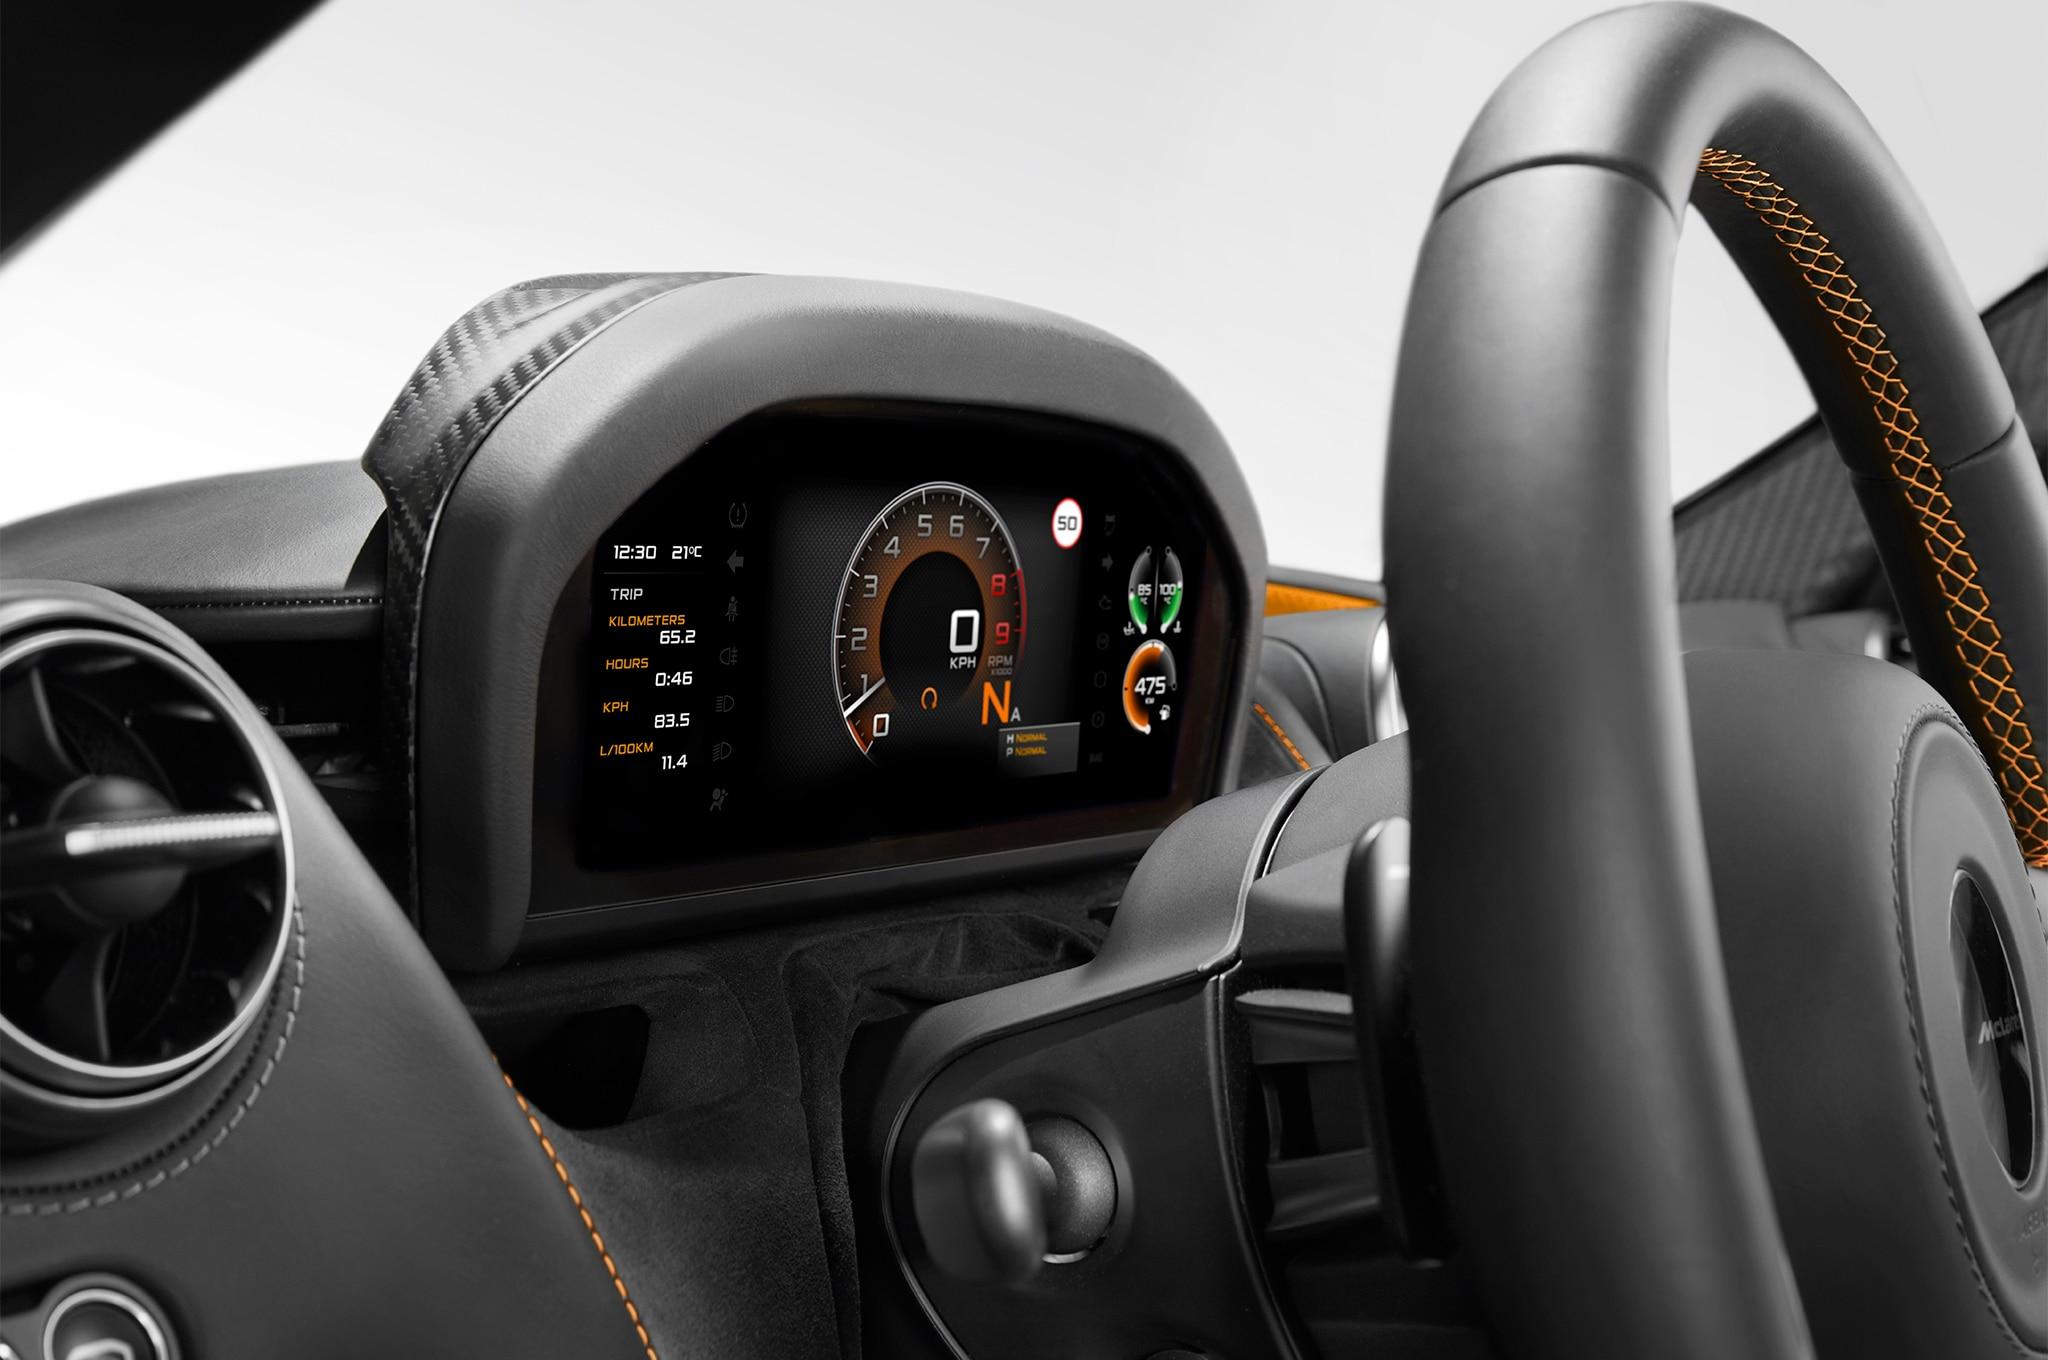 2018 McLaren 720S Folding Driver Display Cluster